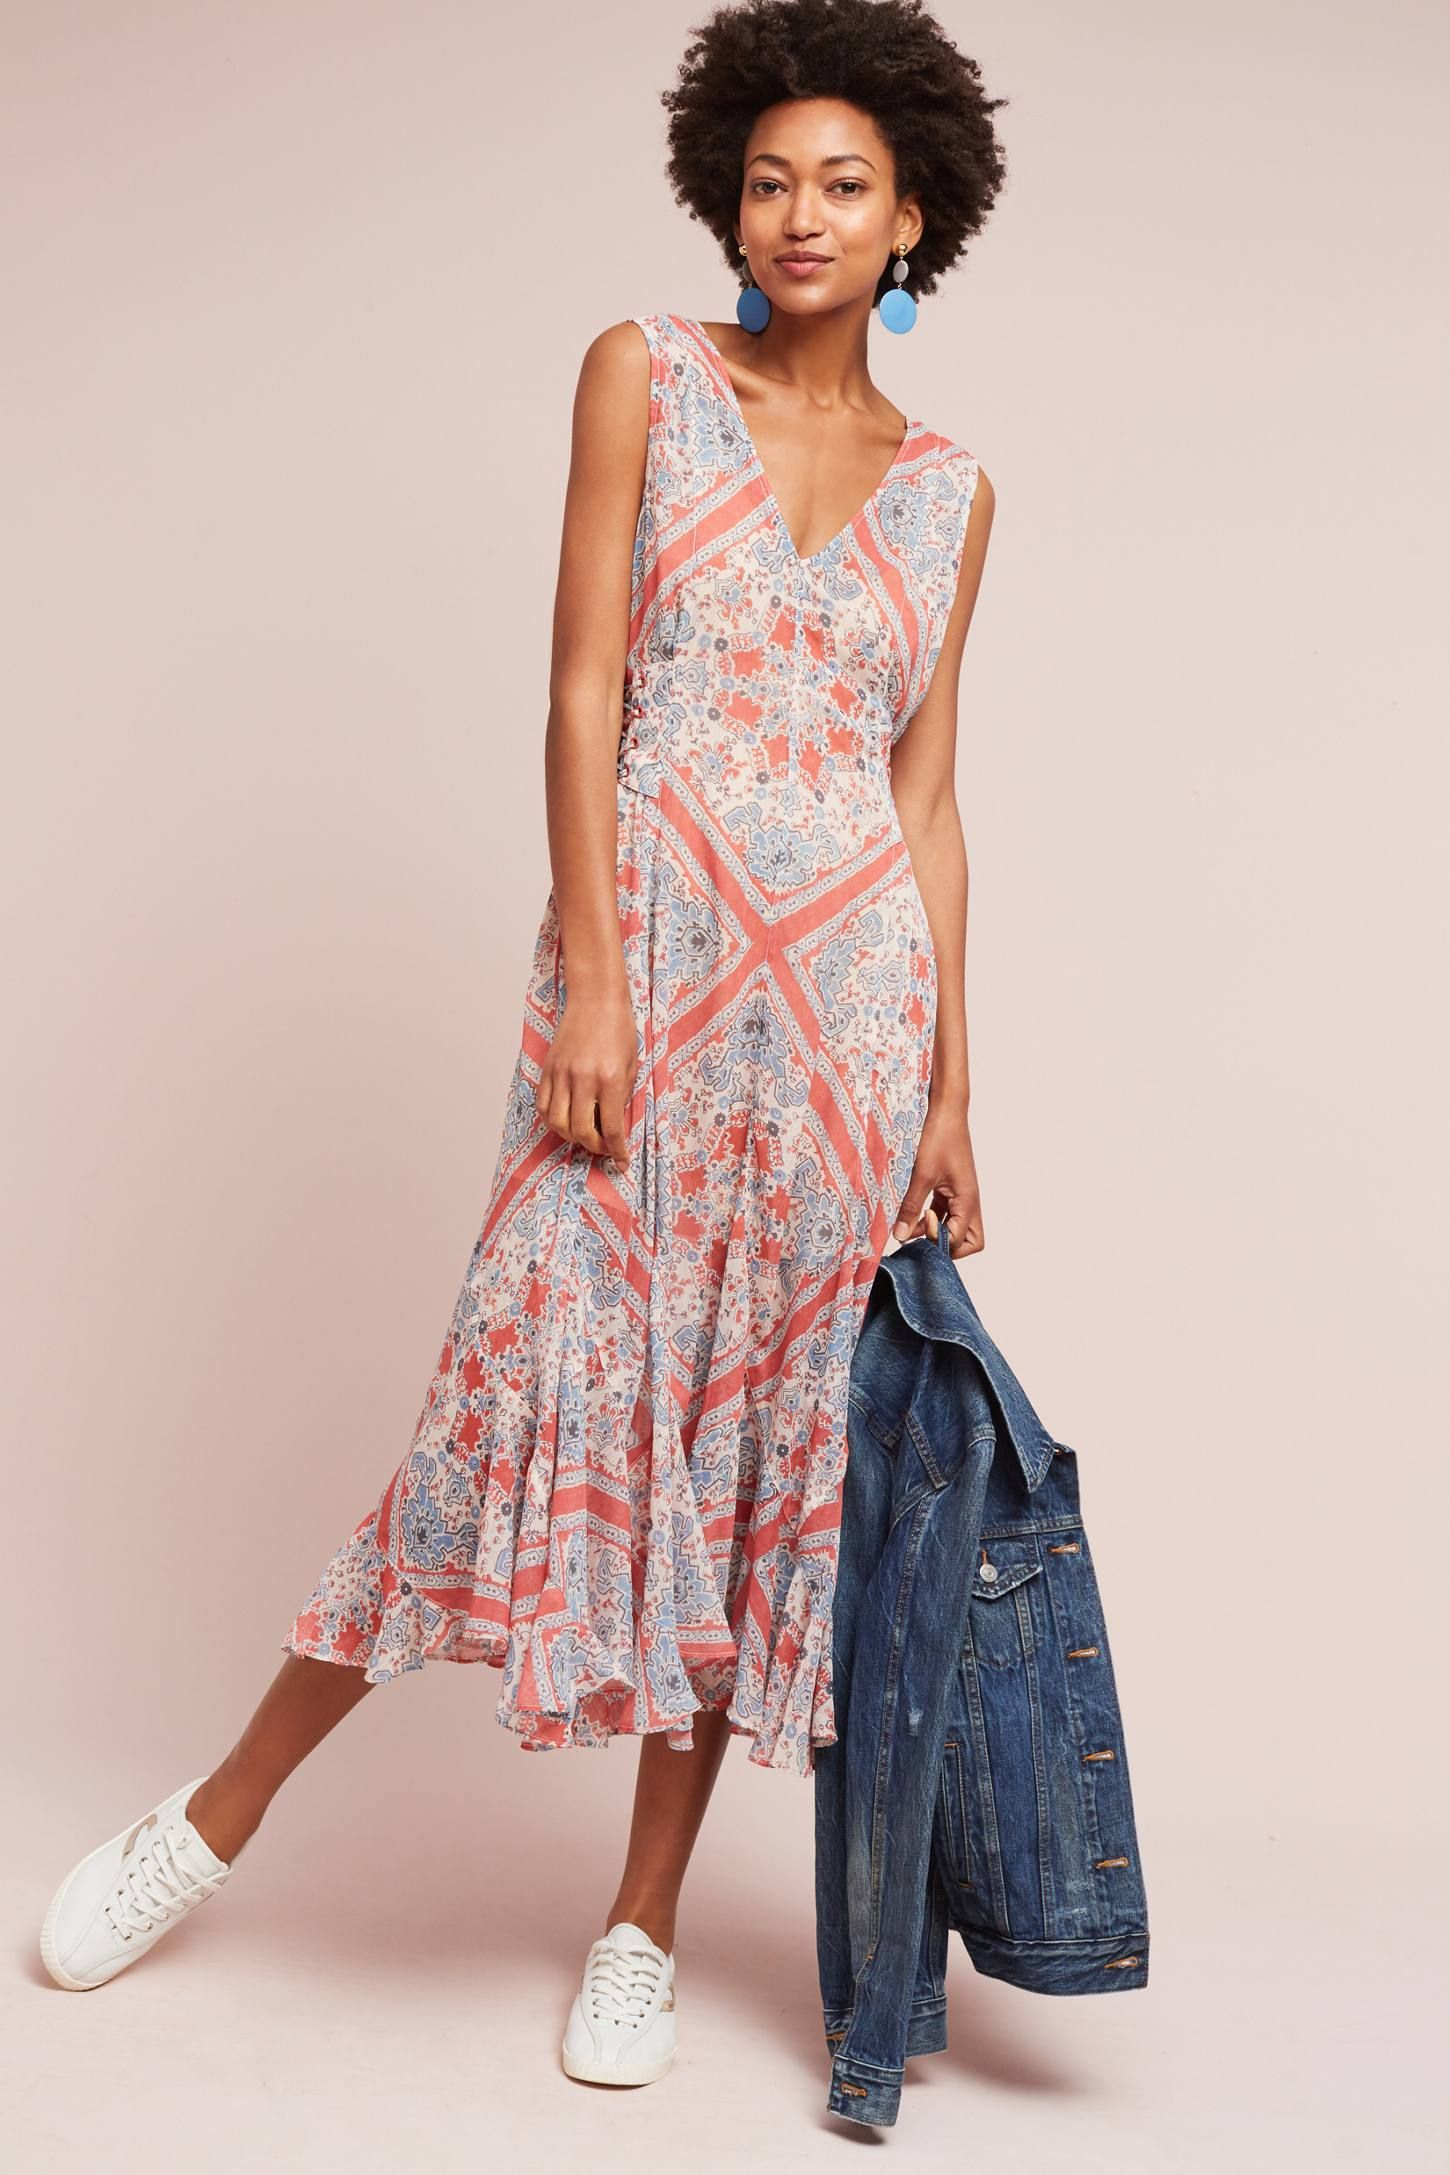 Diya Printed Dress | Moda primavera verano, Moda primavera y ...